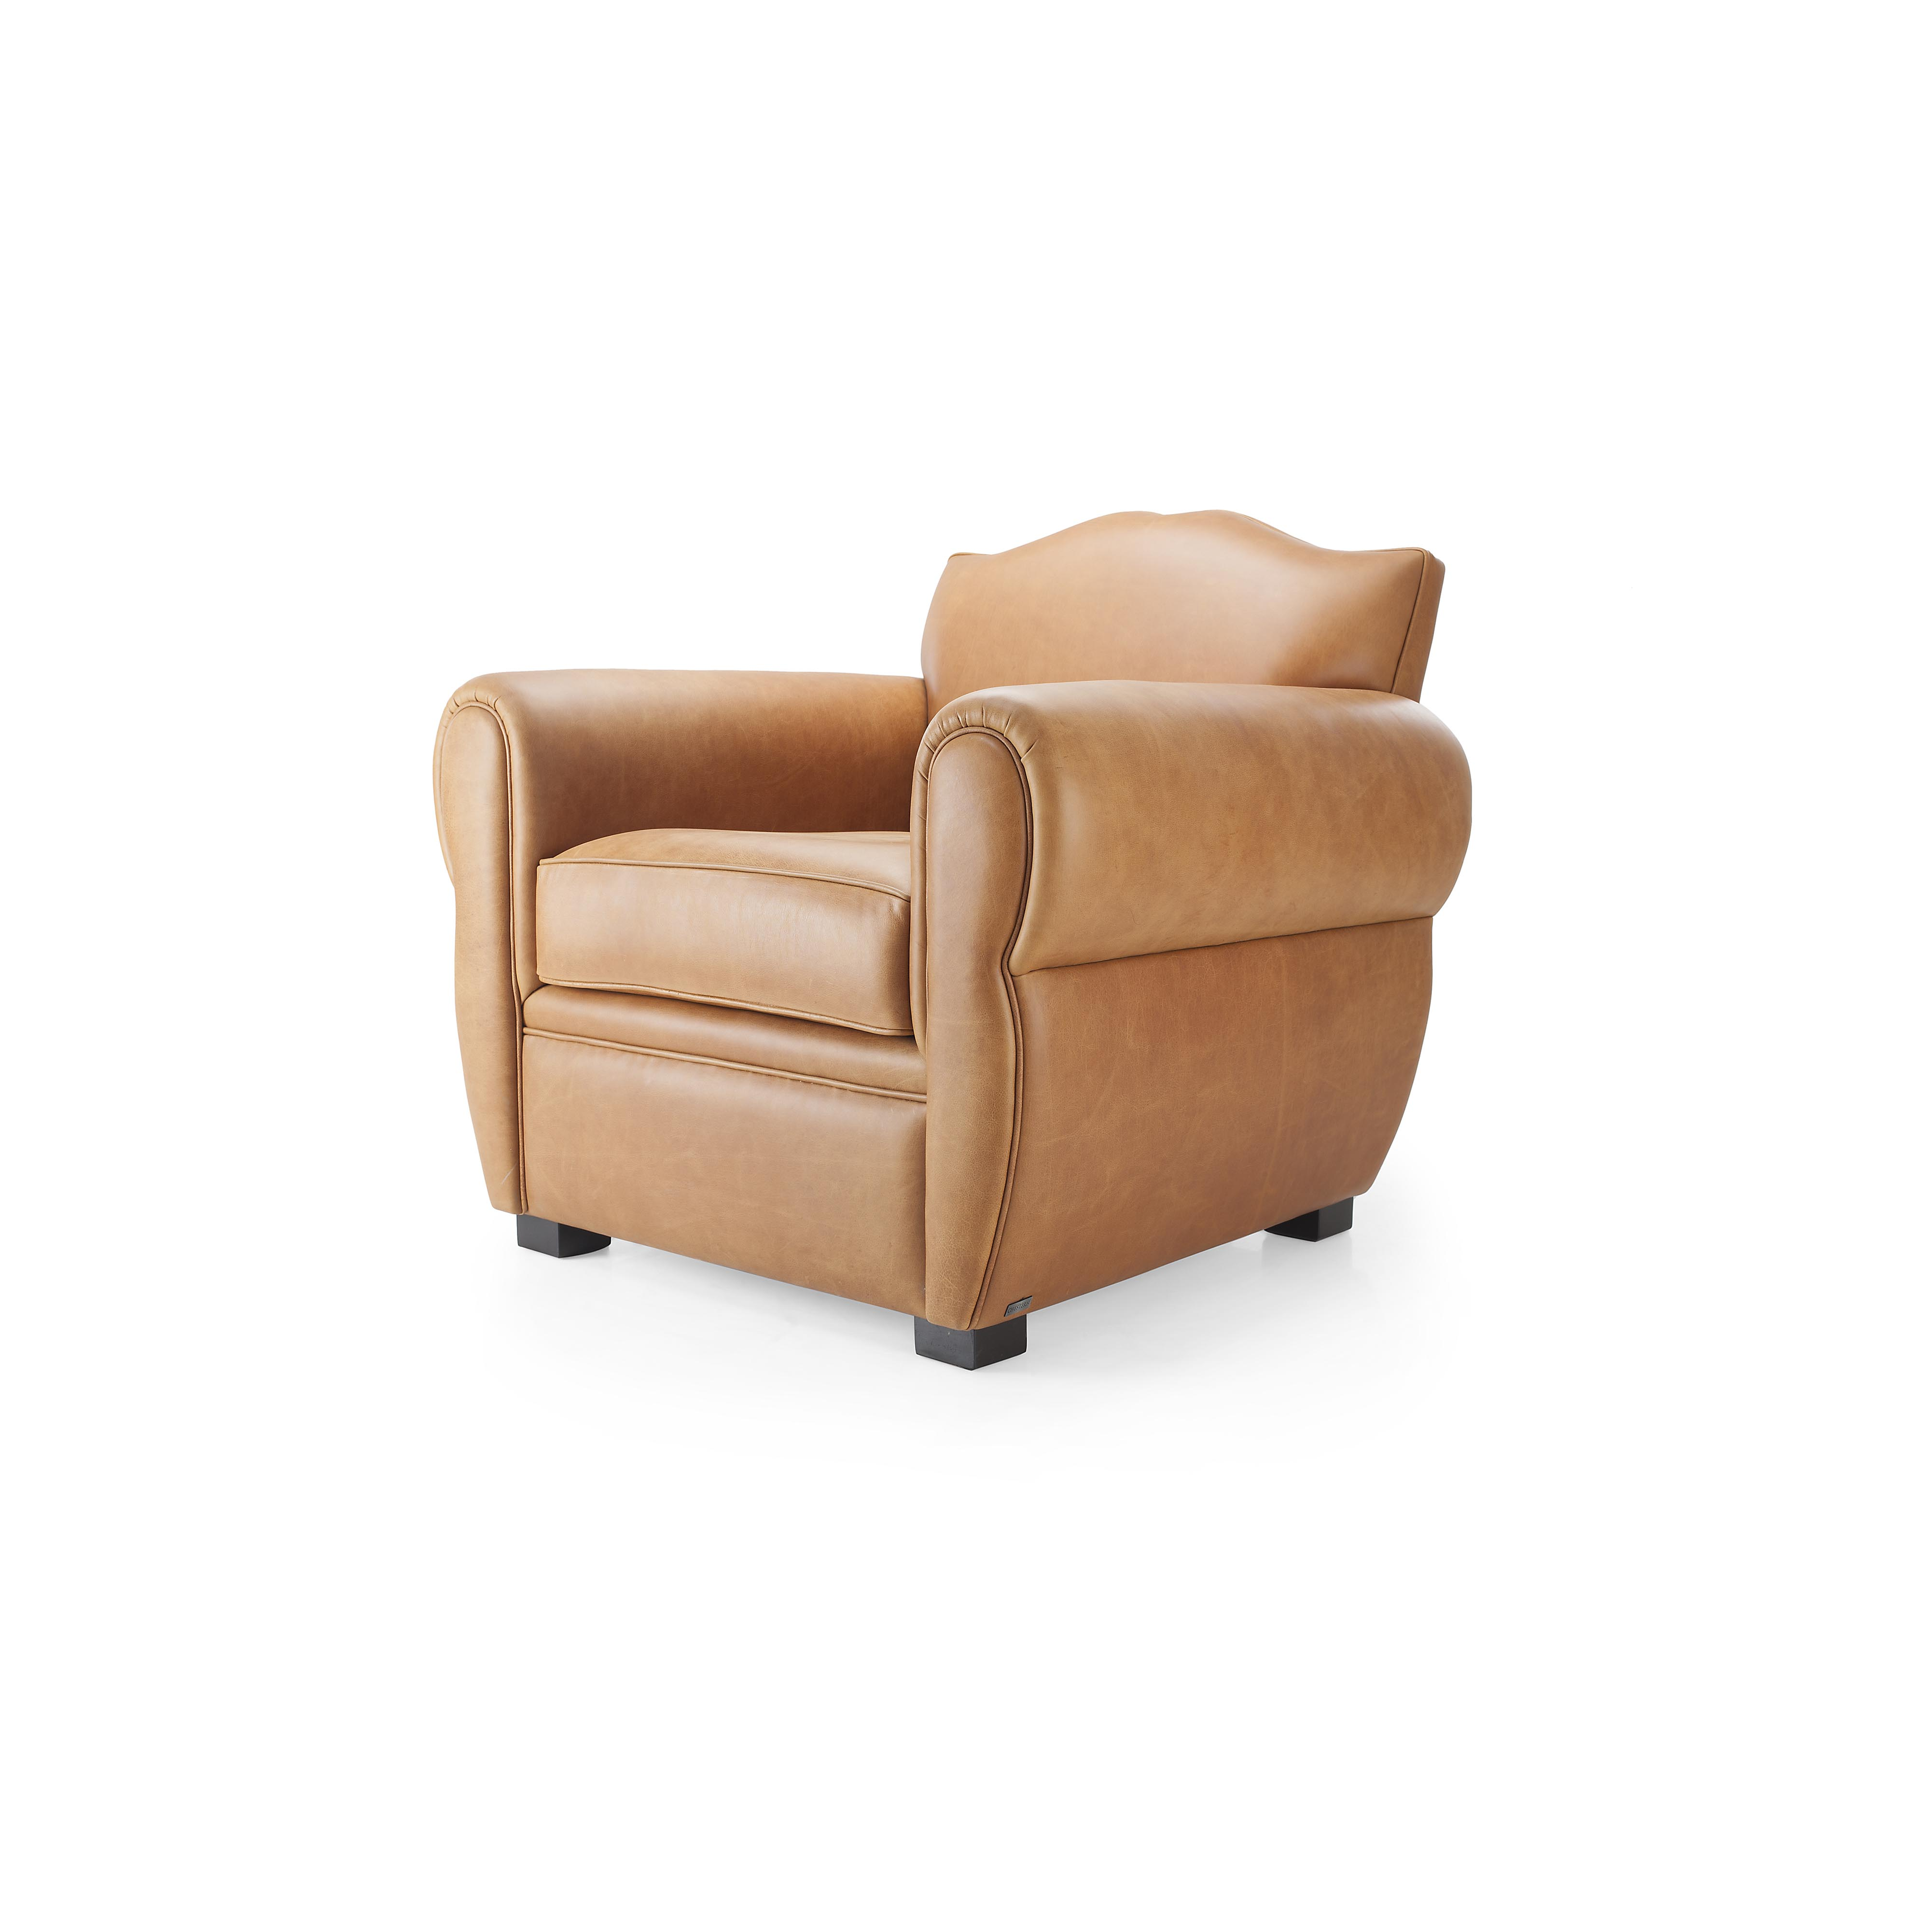 Mustache armchair